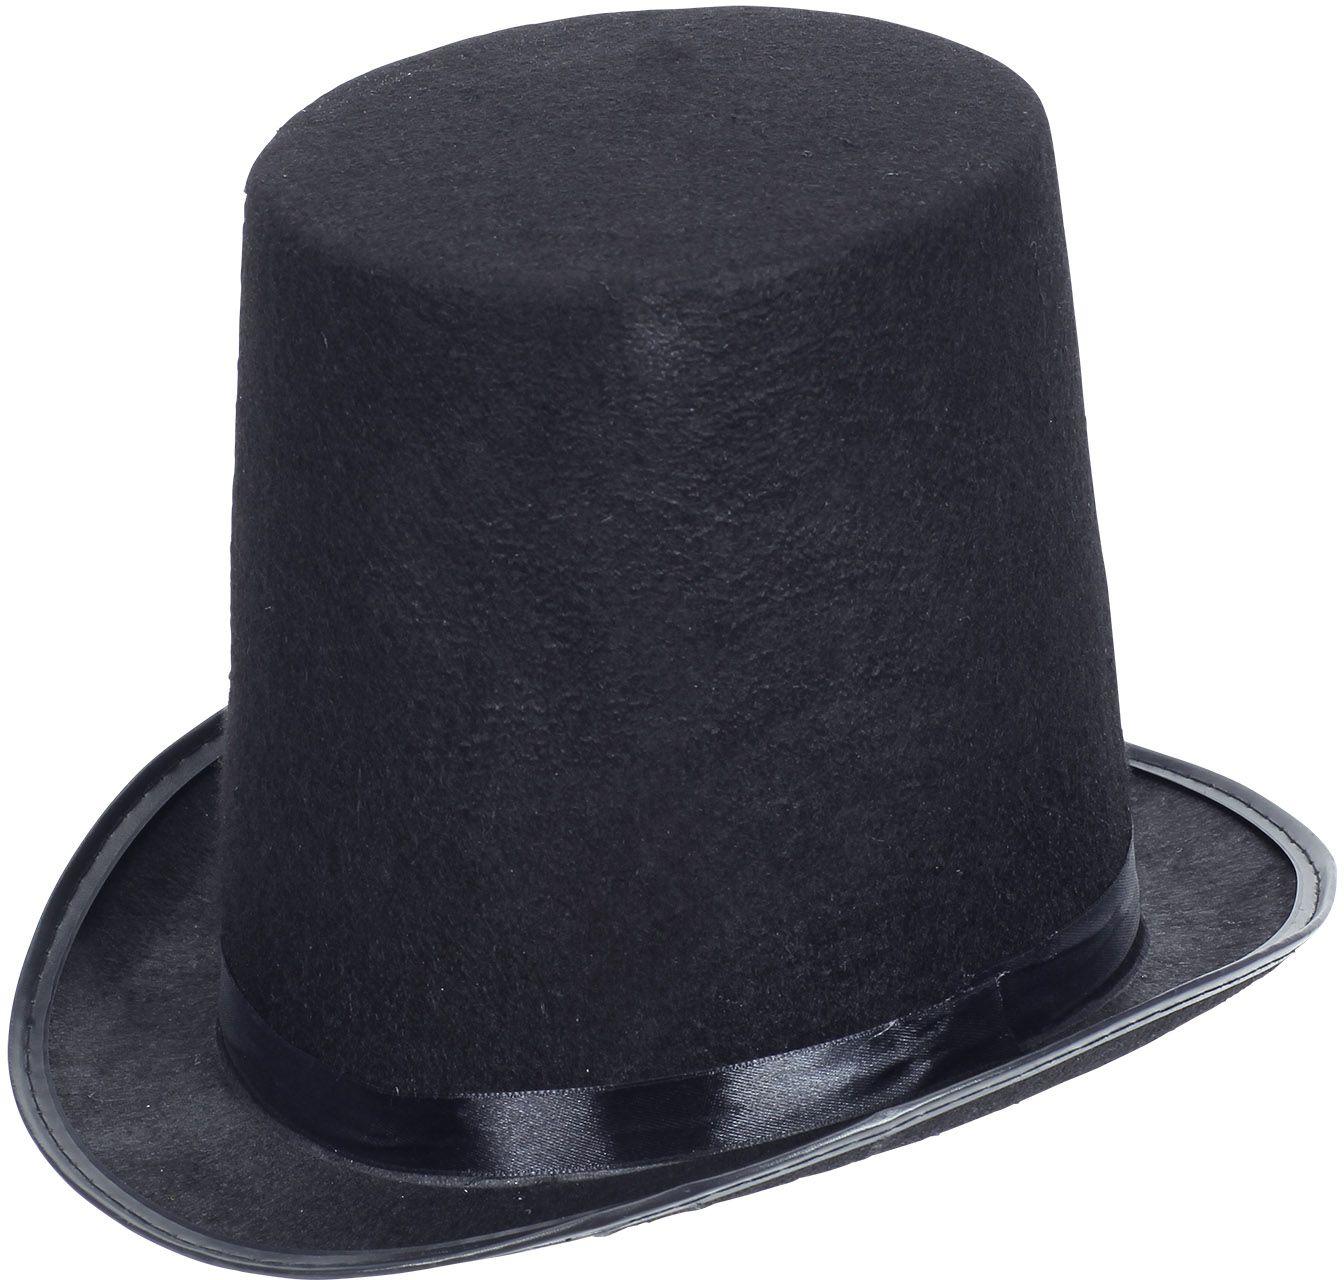 Zwarte hoge circus hoed